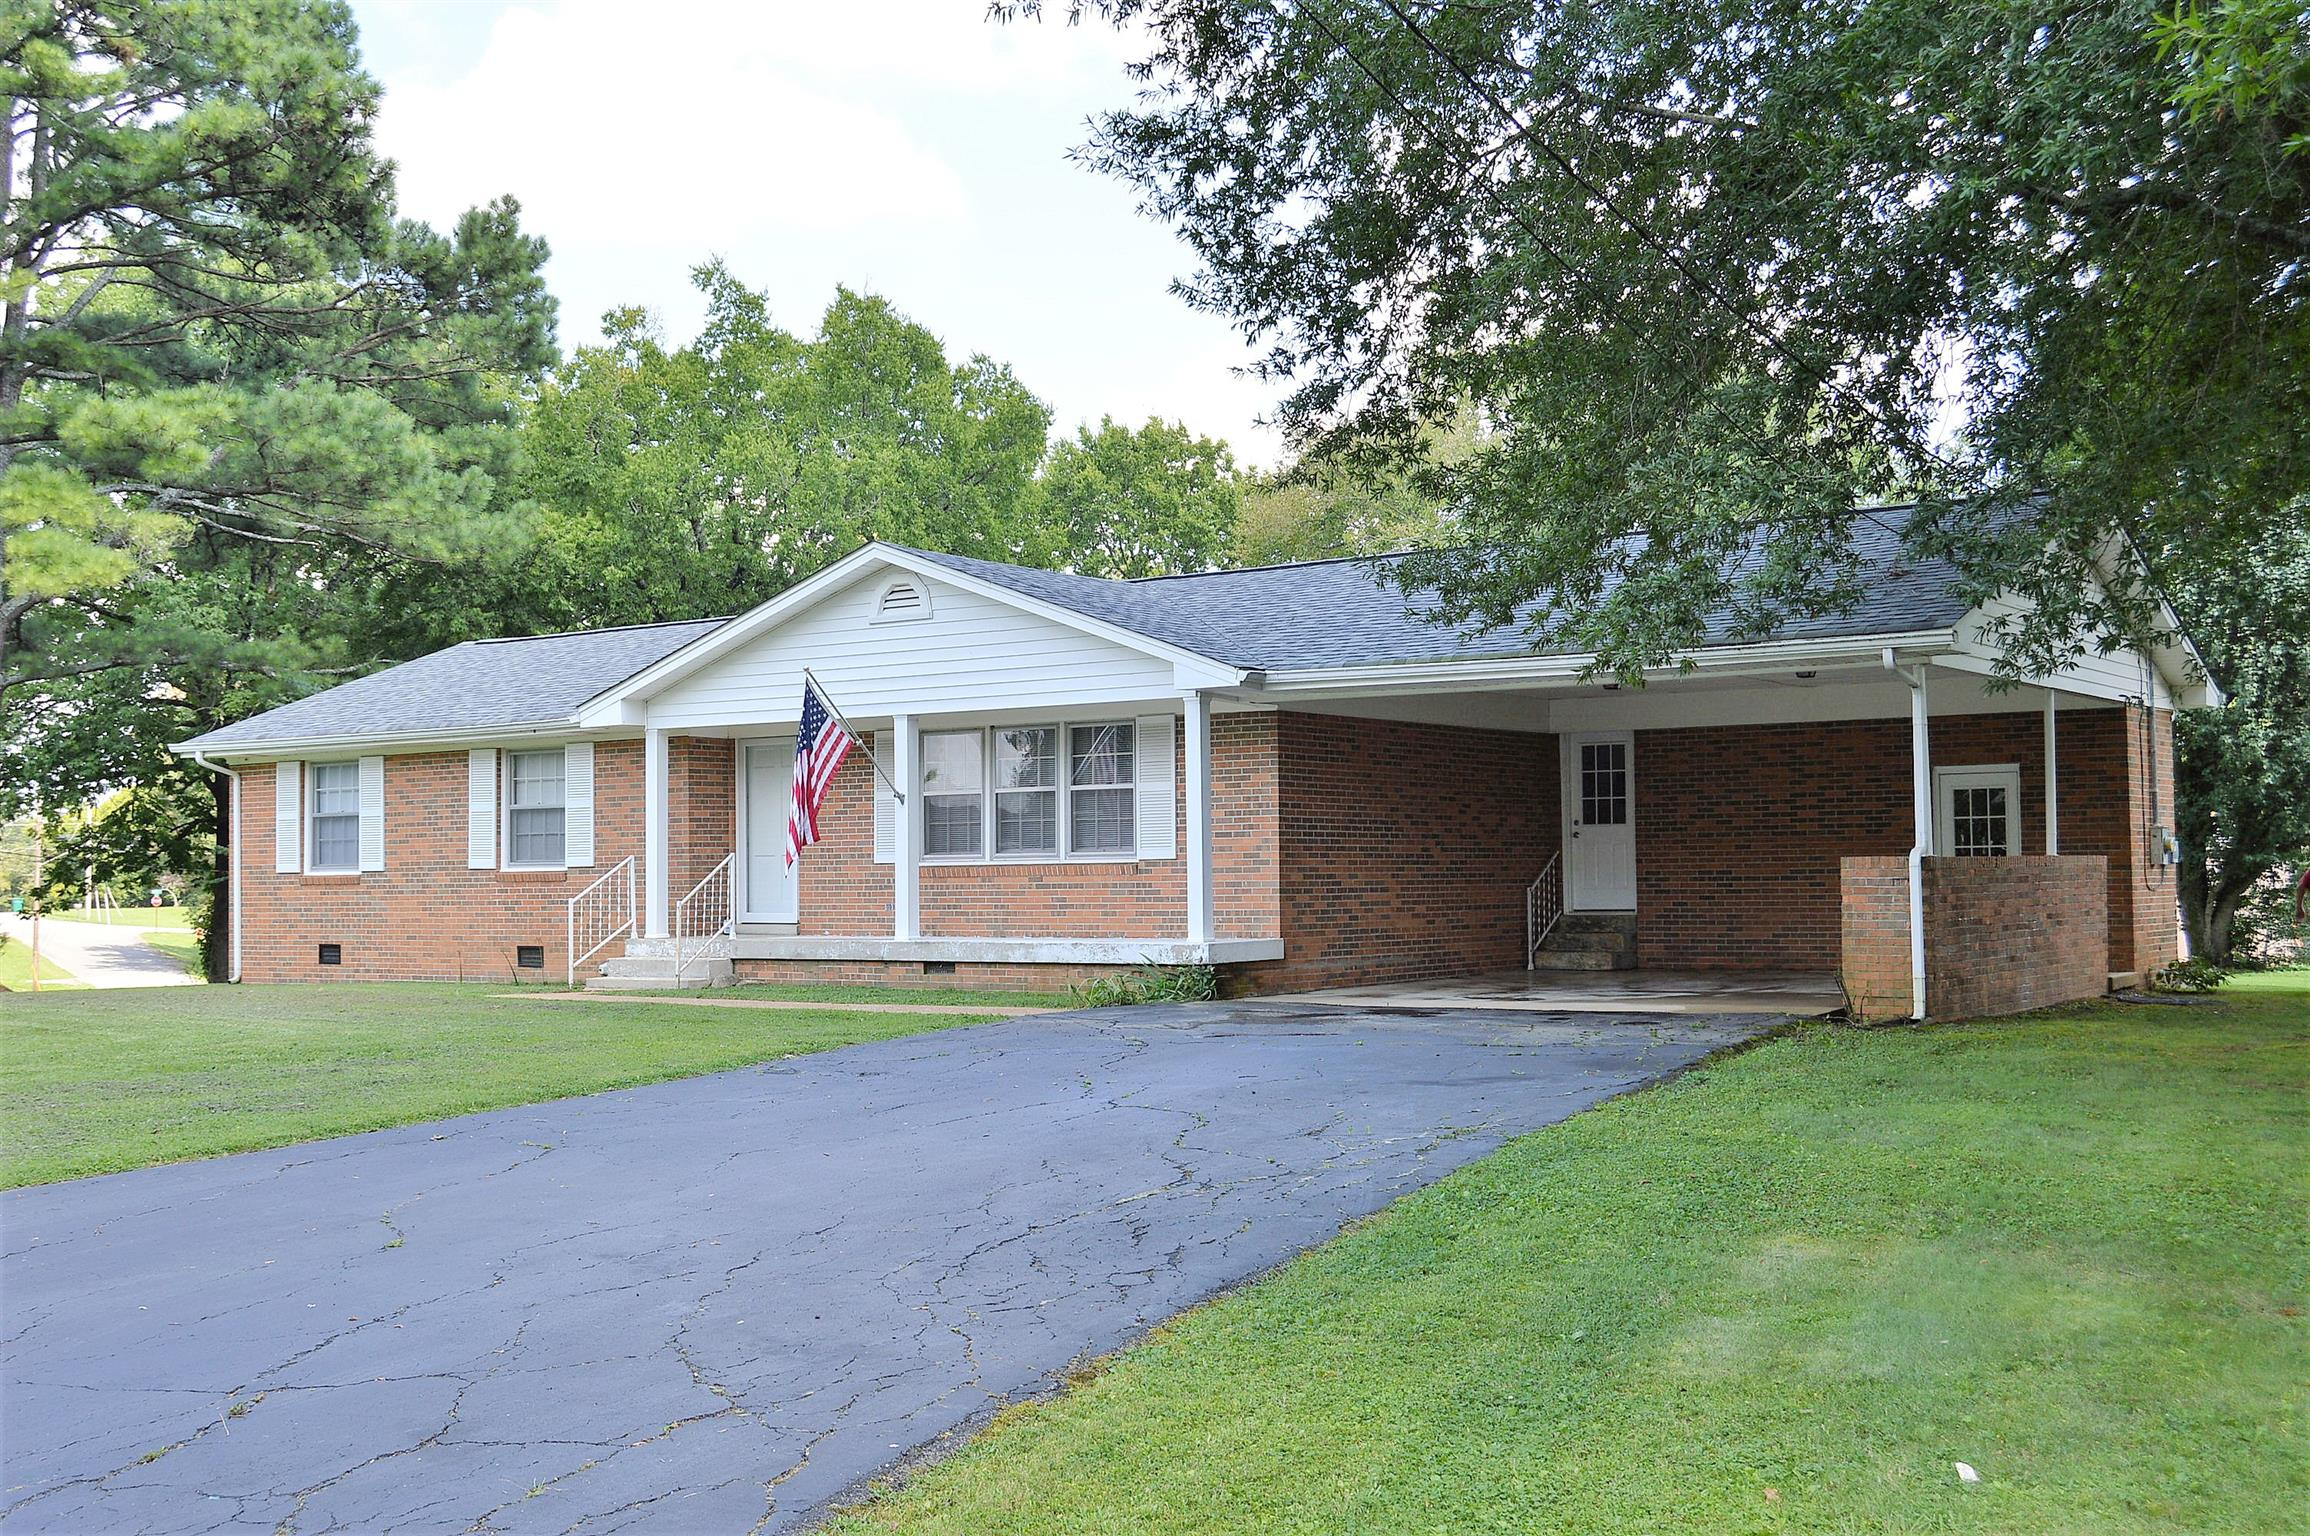 605 Fairlane Dr, Lewisburg, TN 37091 - Lewisburg, TN real estate listing